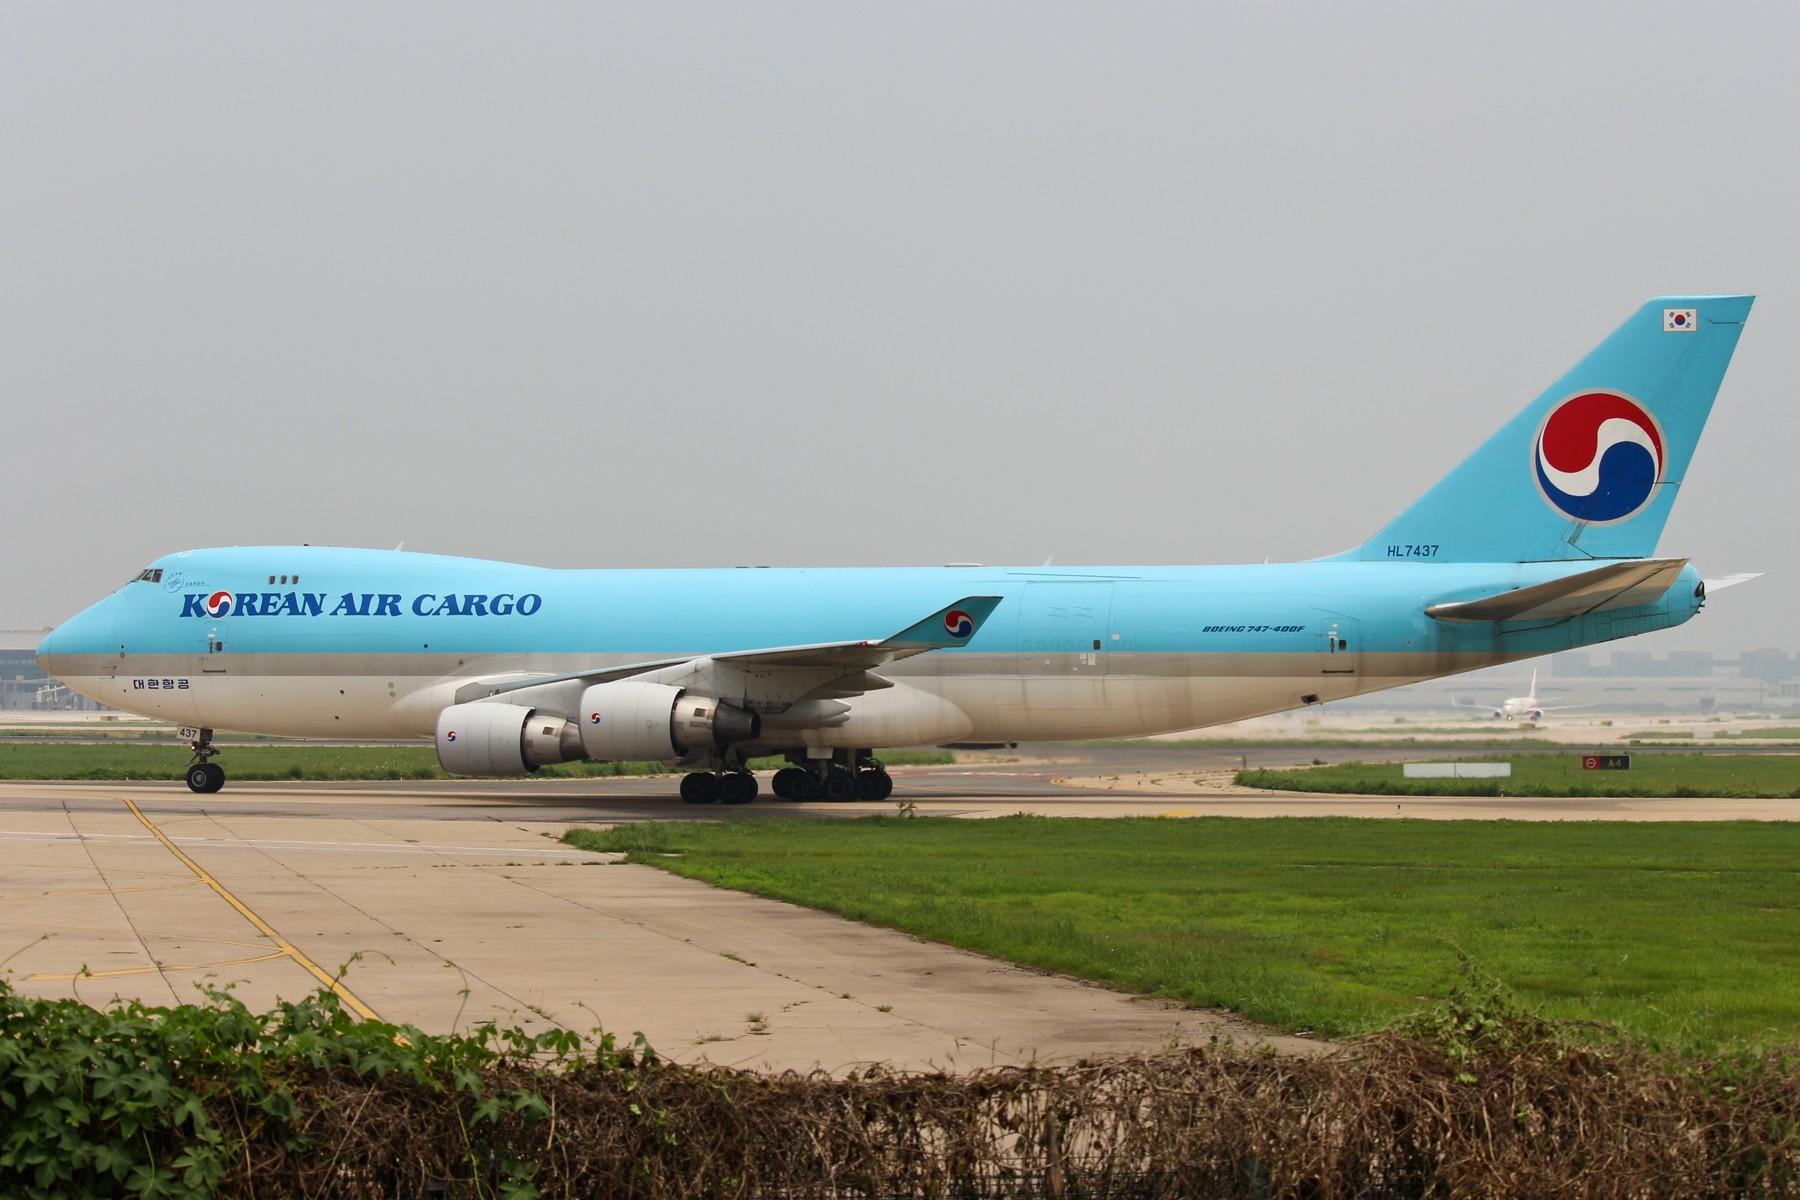 Re:[原创]【TSN飞友会】1800*1200 近期TSN集锦 不看绝对后悔 BOEING 747-400F  中国天津滨海国际机场